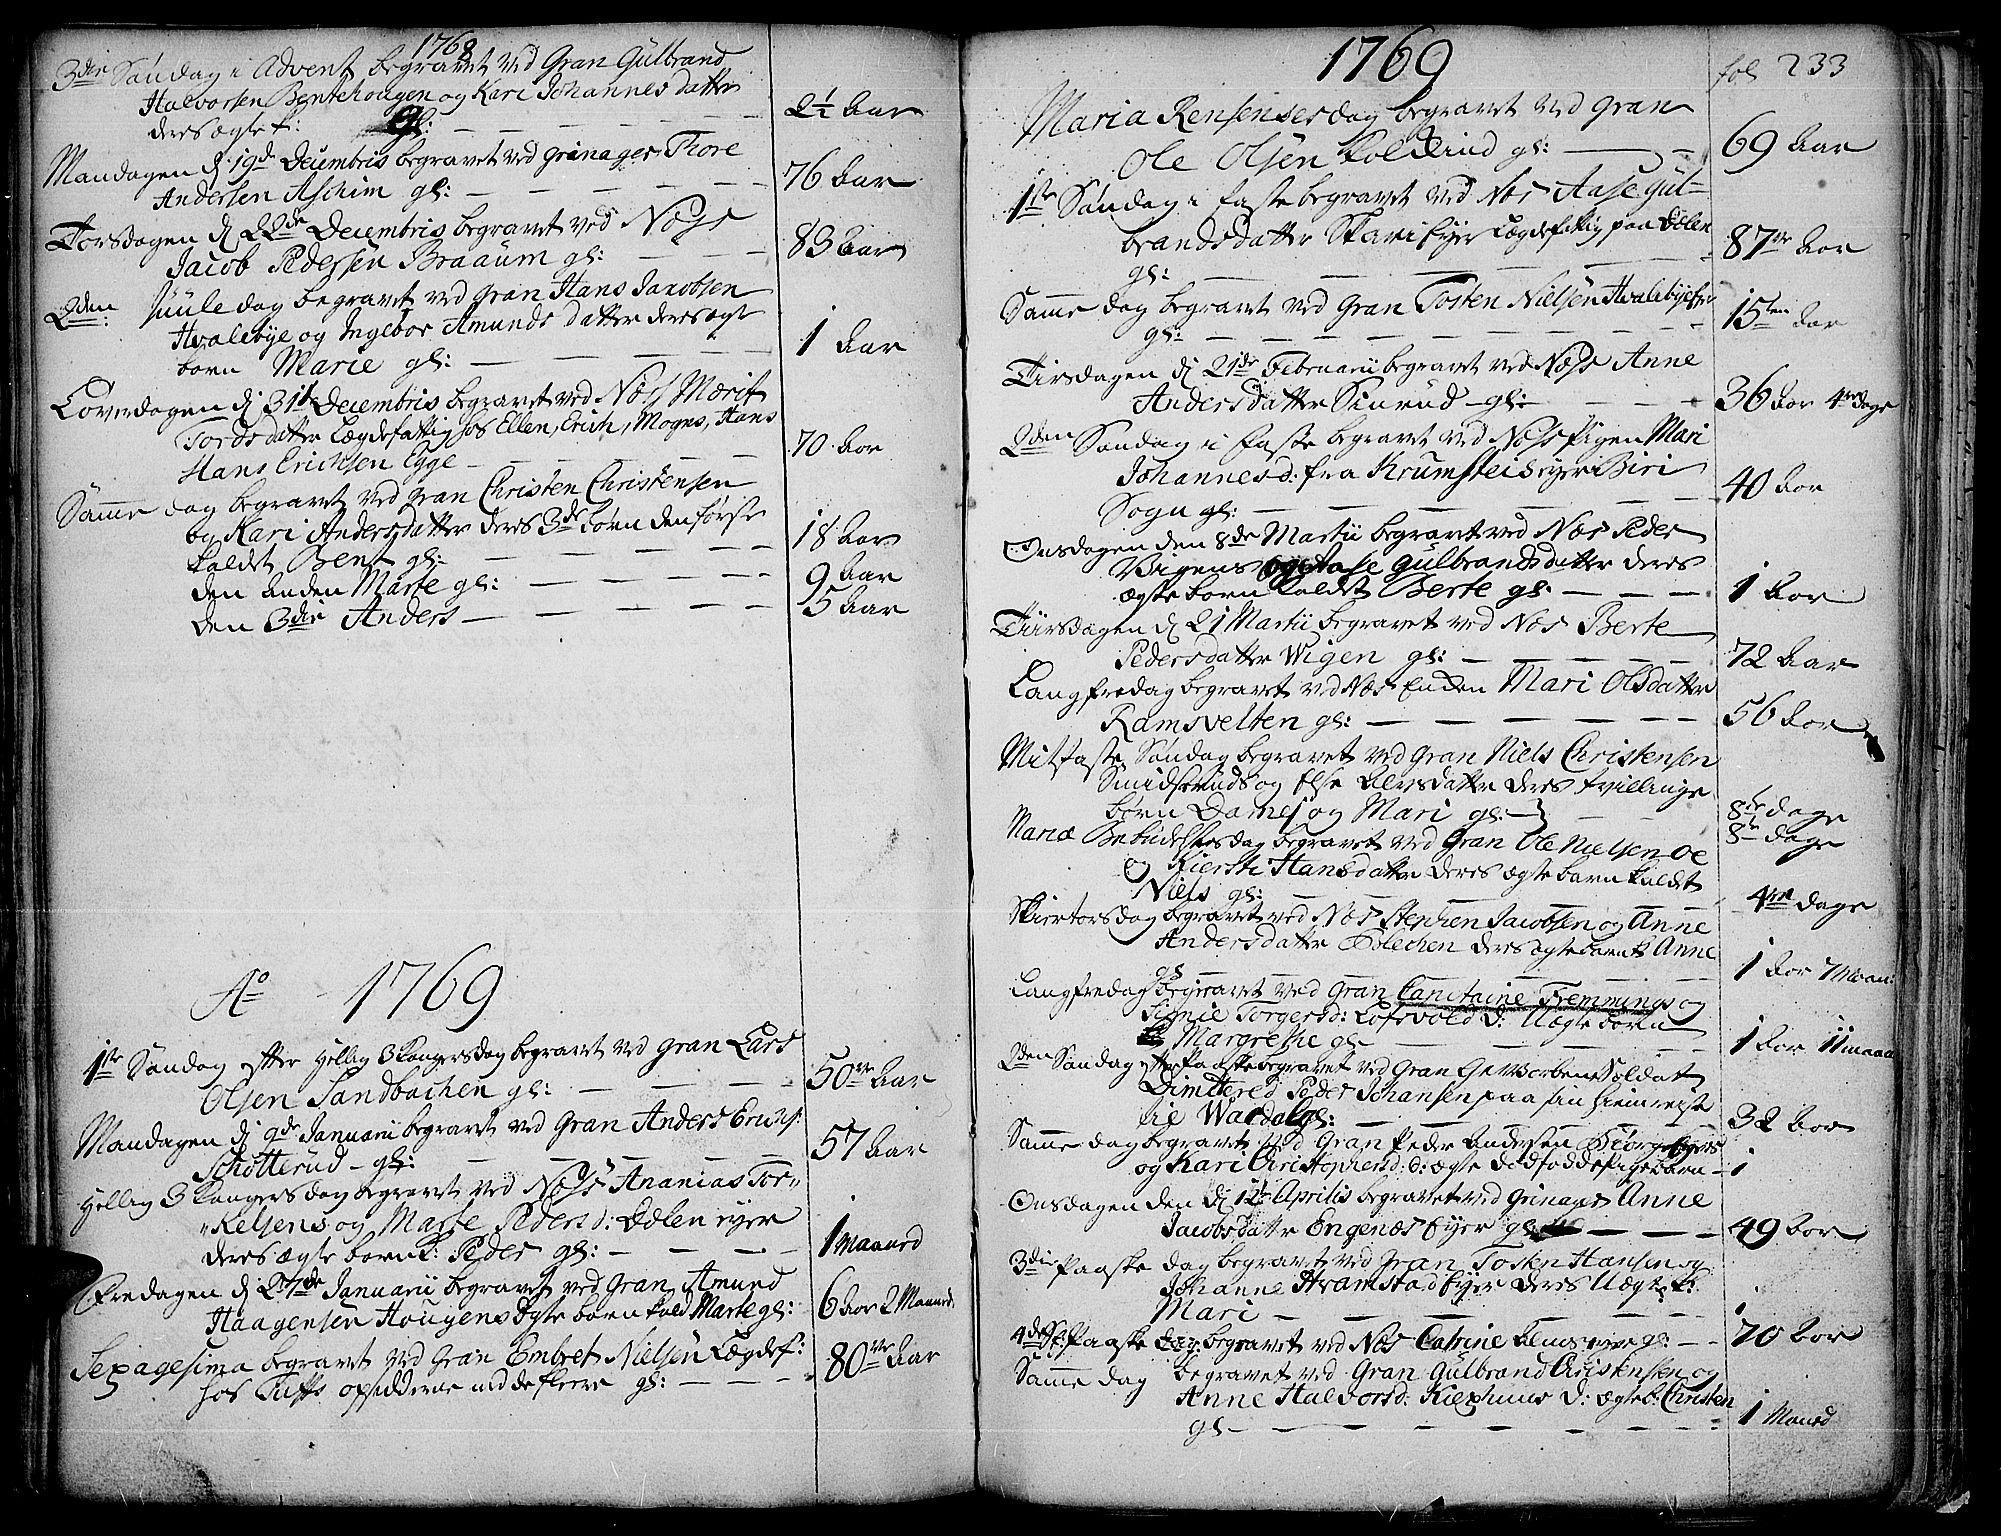 SAH, Gran prestekontor, Ministerialbok nr. 4, 1759-1775, s. 233